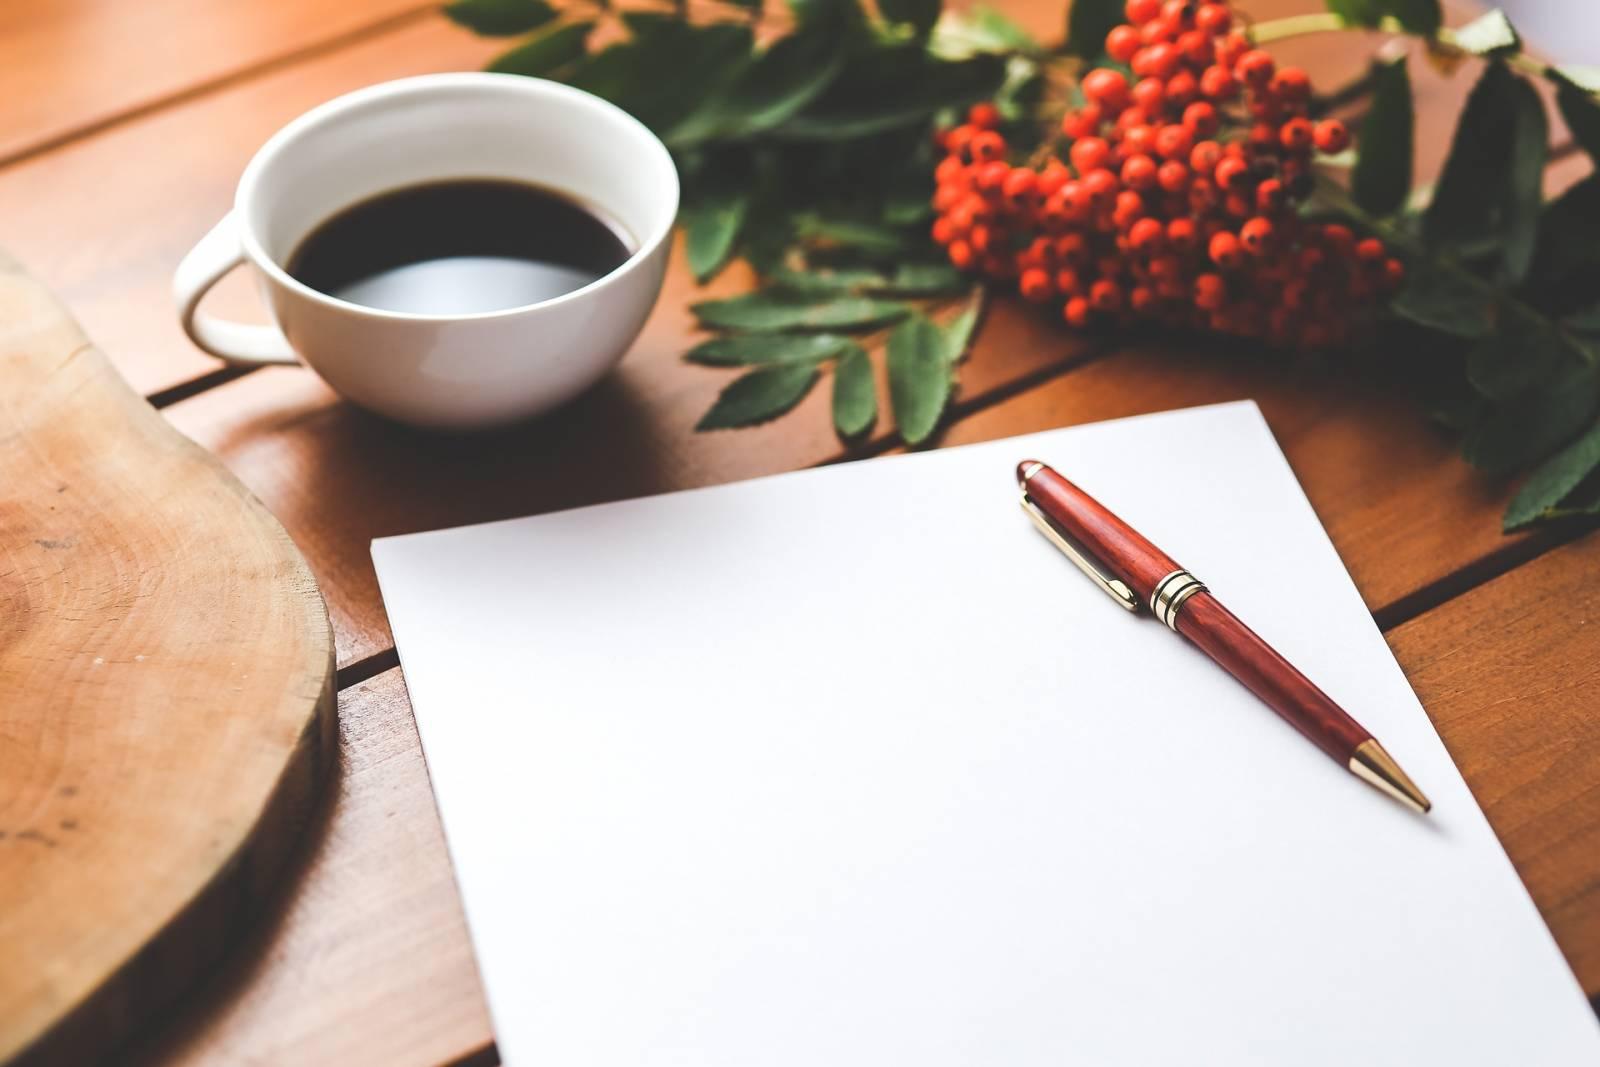 paperi, kynä, kahvikuppi